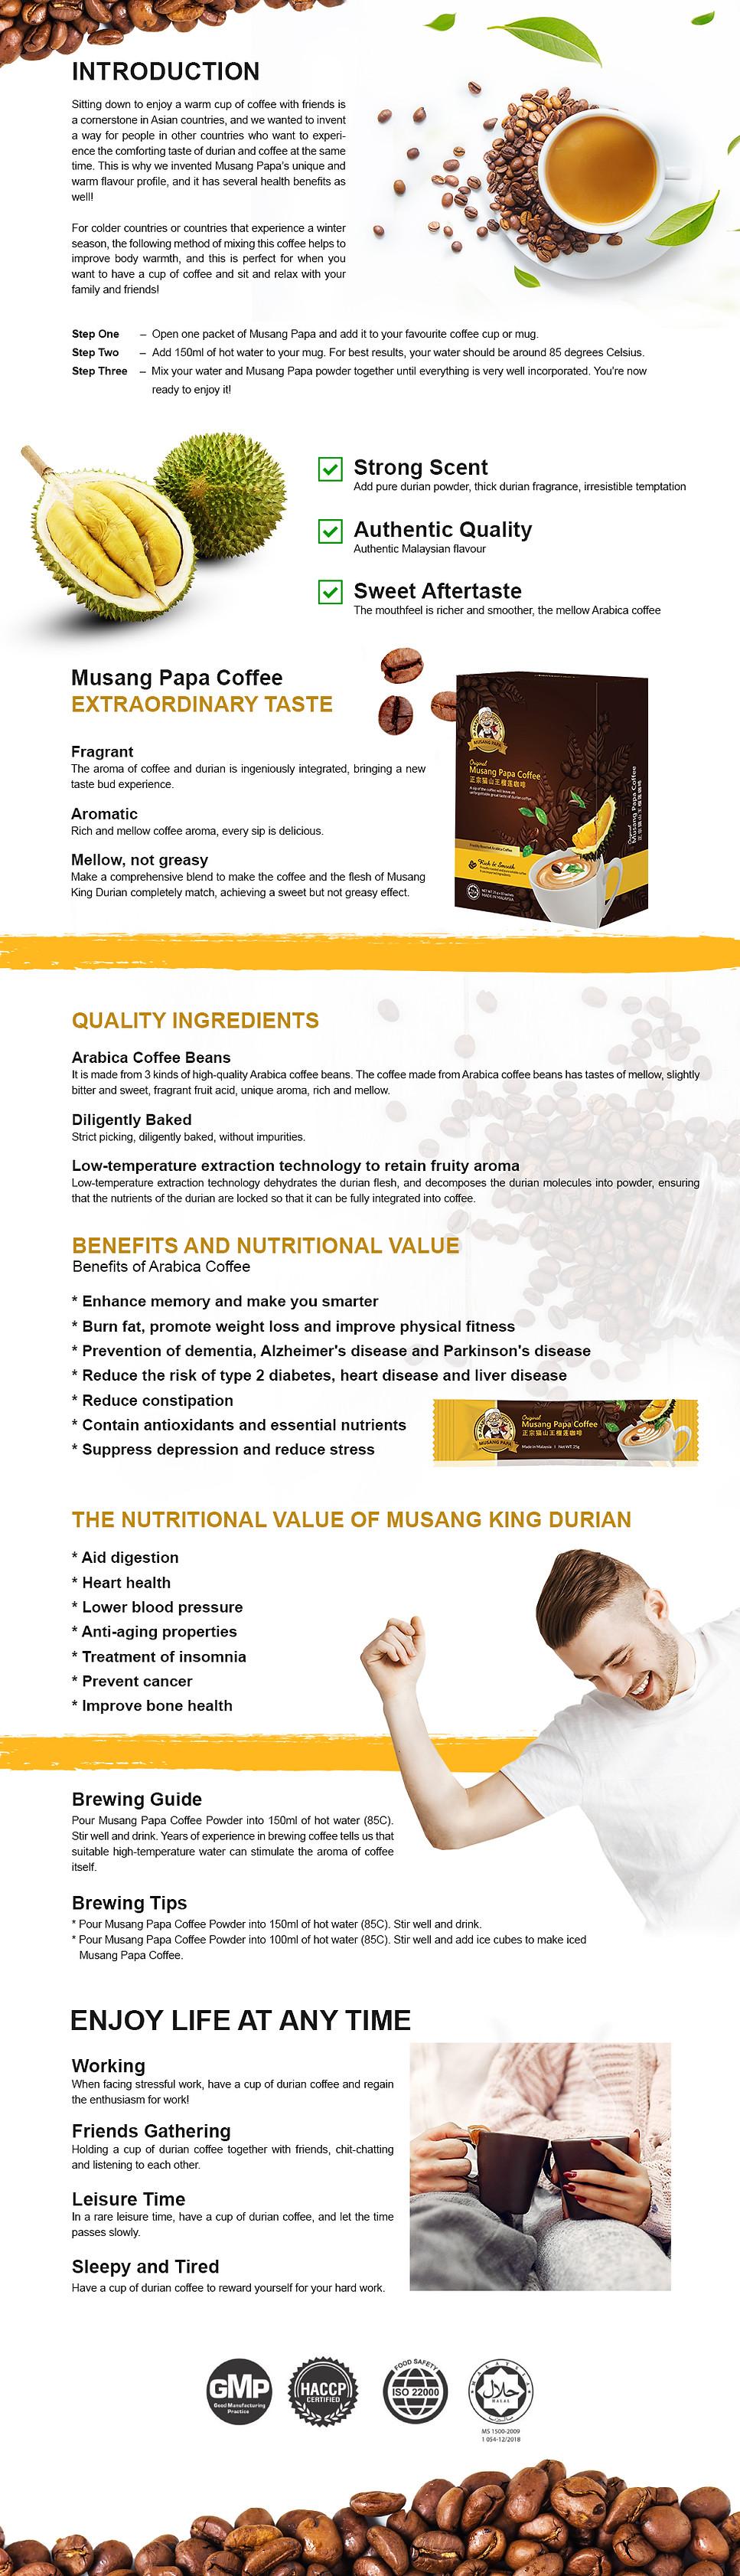 website coffee product design.jpg